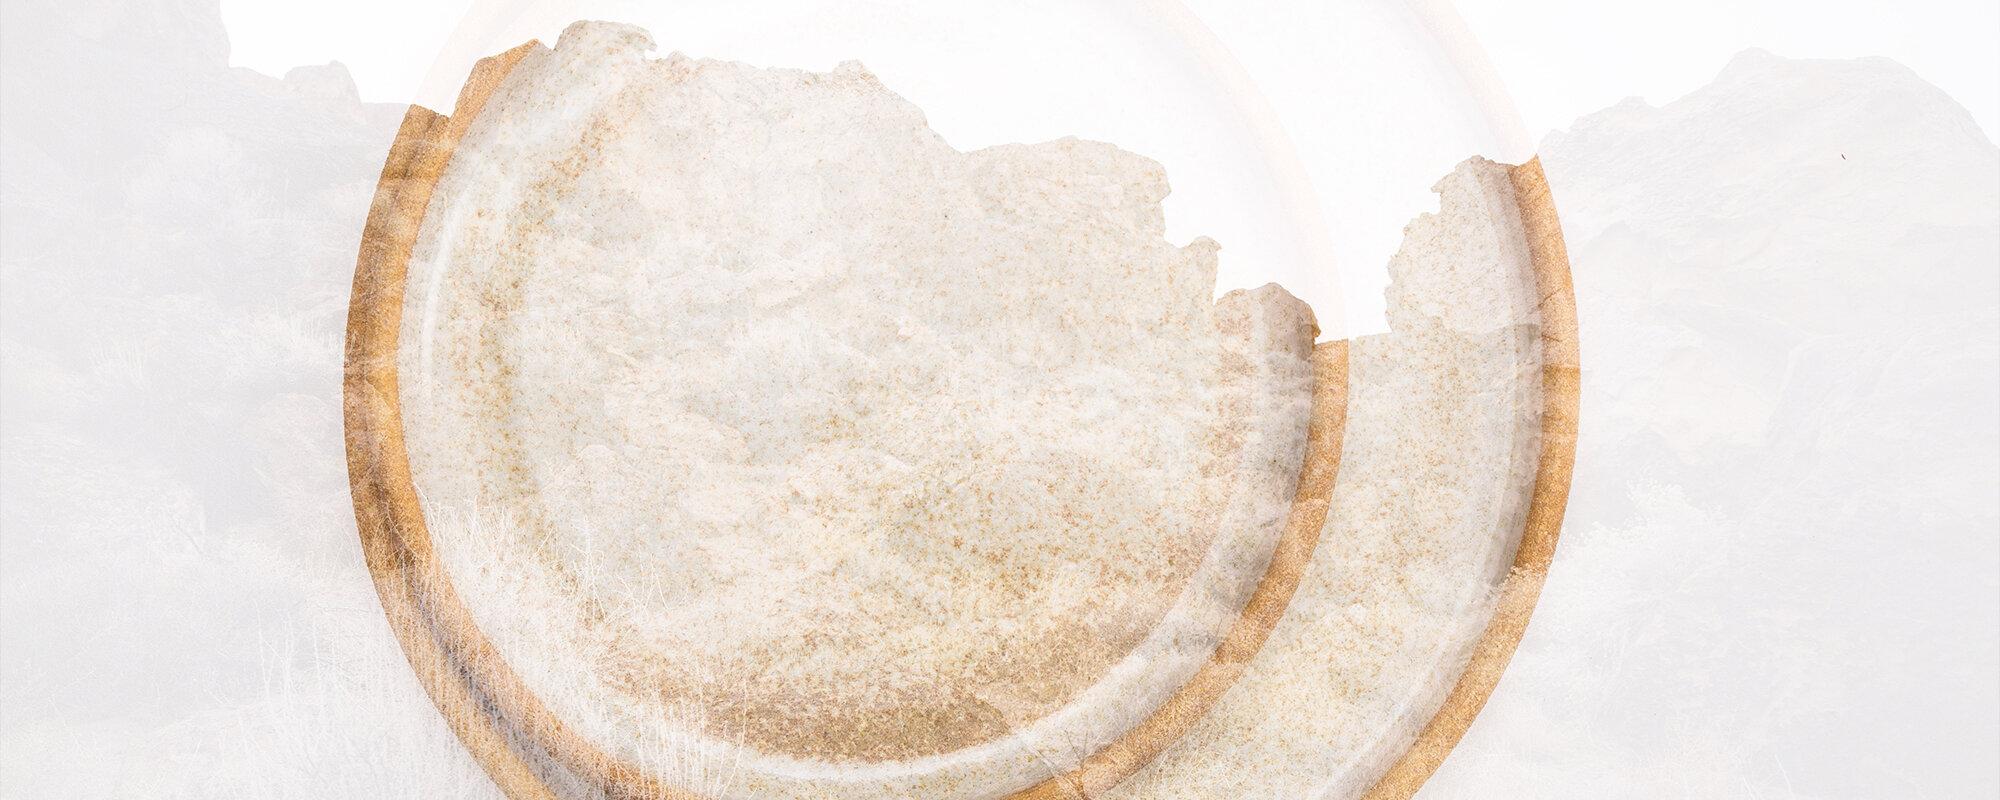 High Desert Collection - Hand-thrown durable tableware